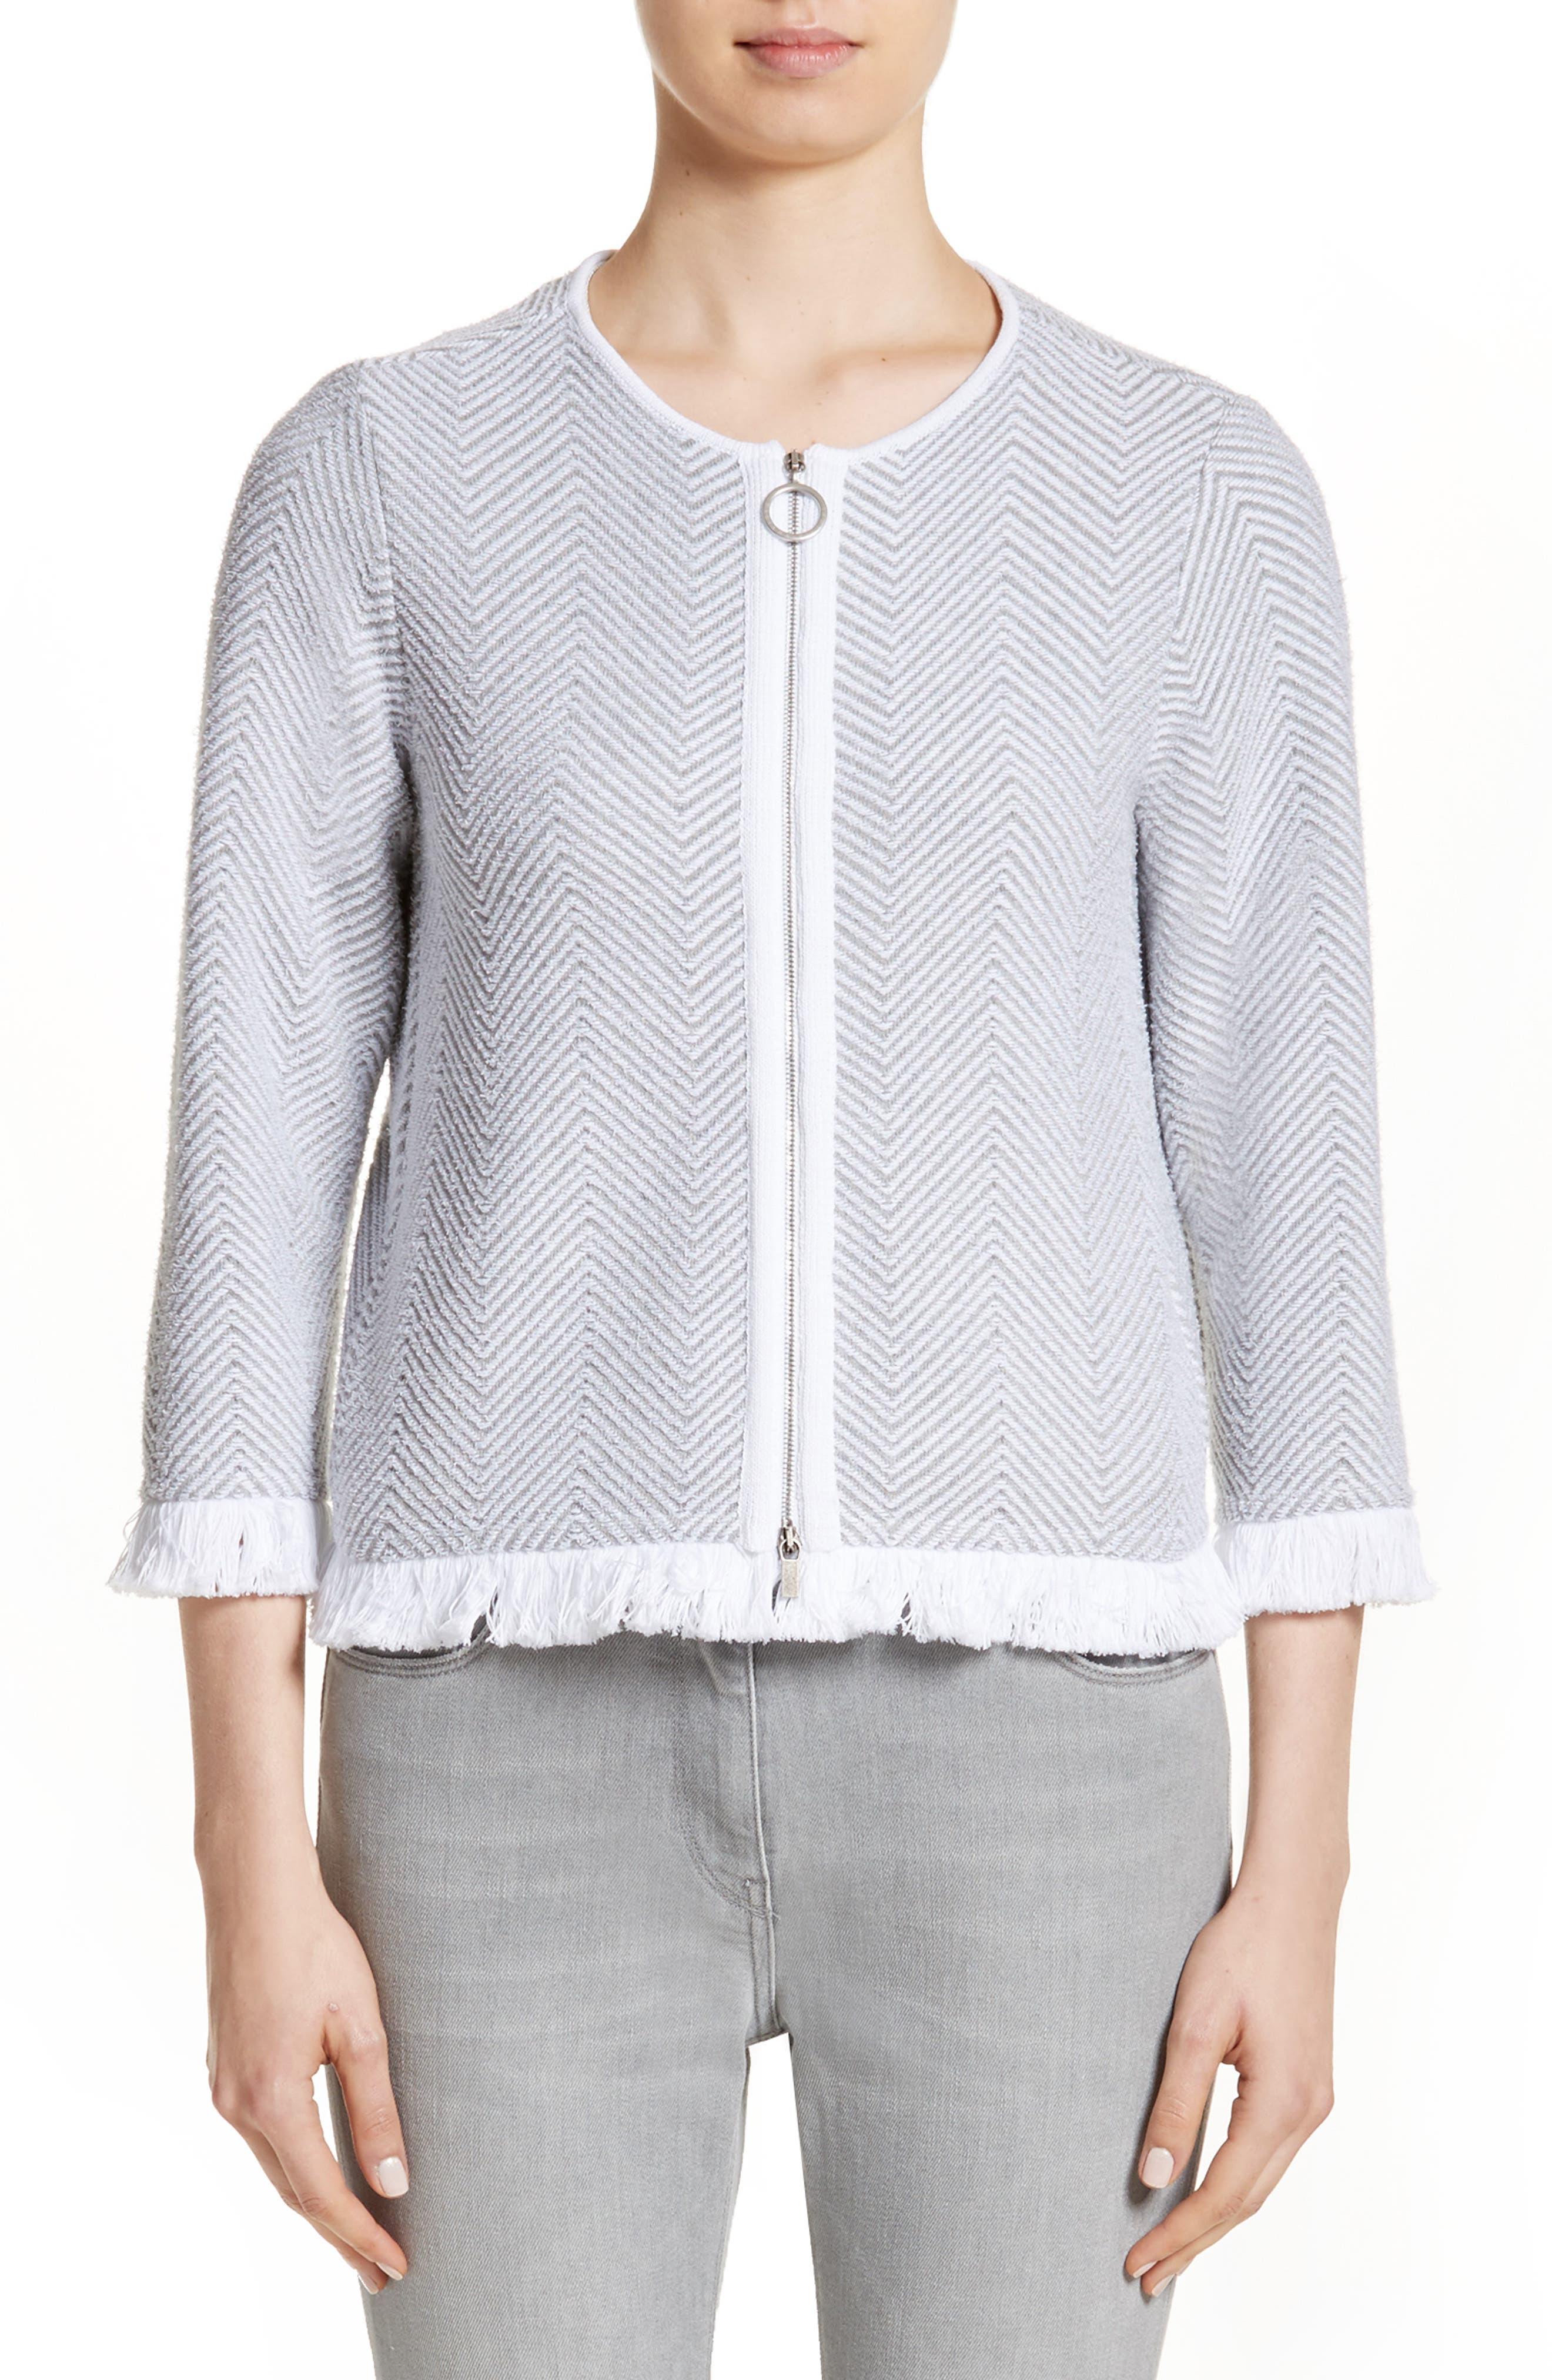 Chevron Knit Jacket,                         Main,                         color, 050